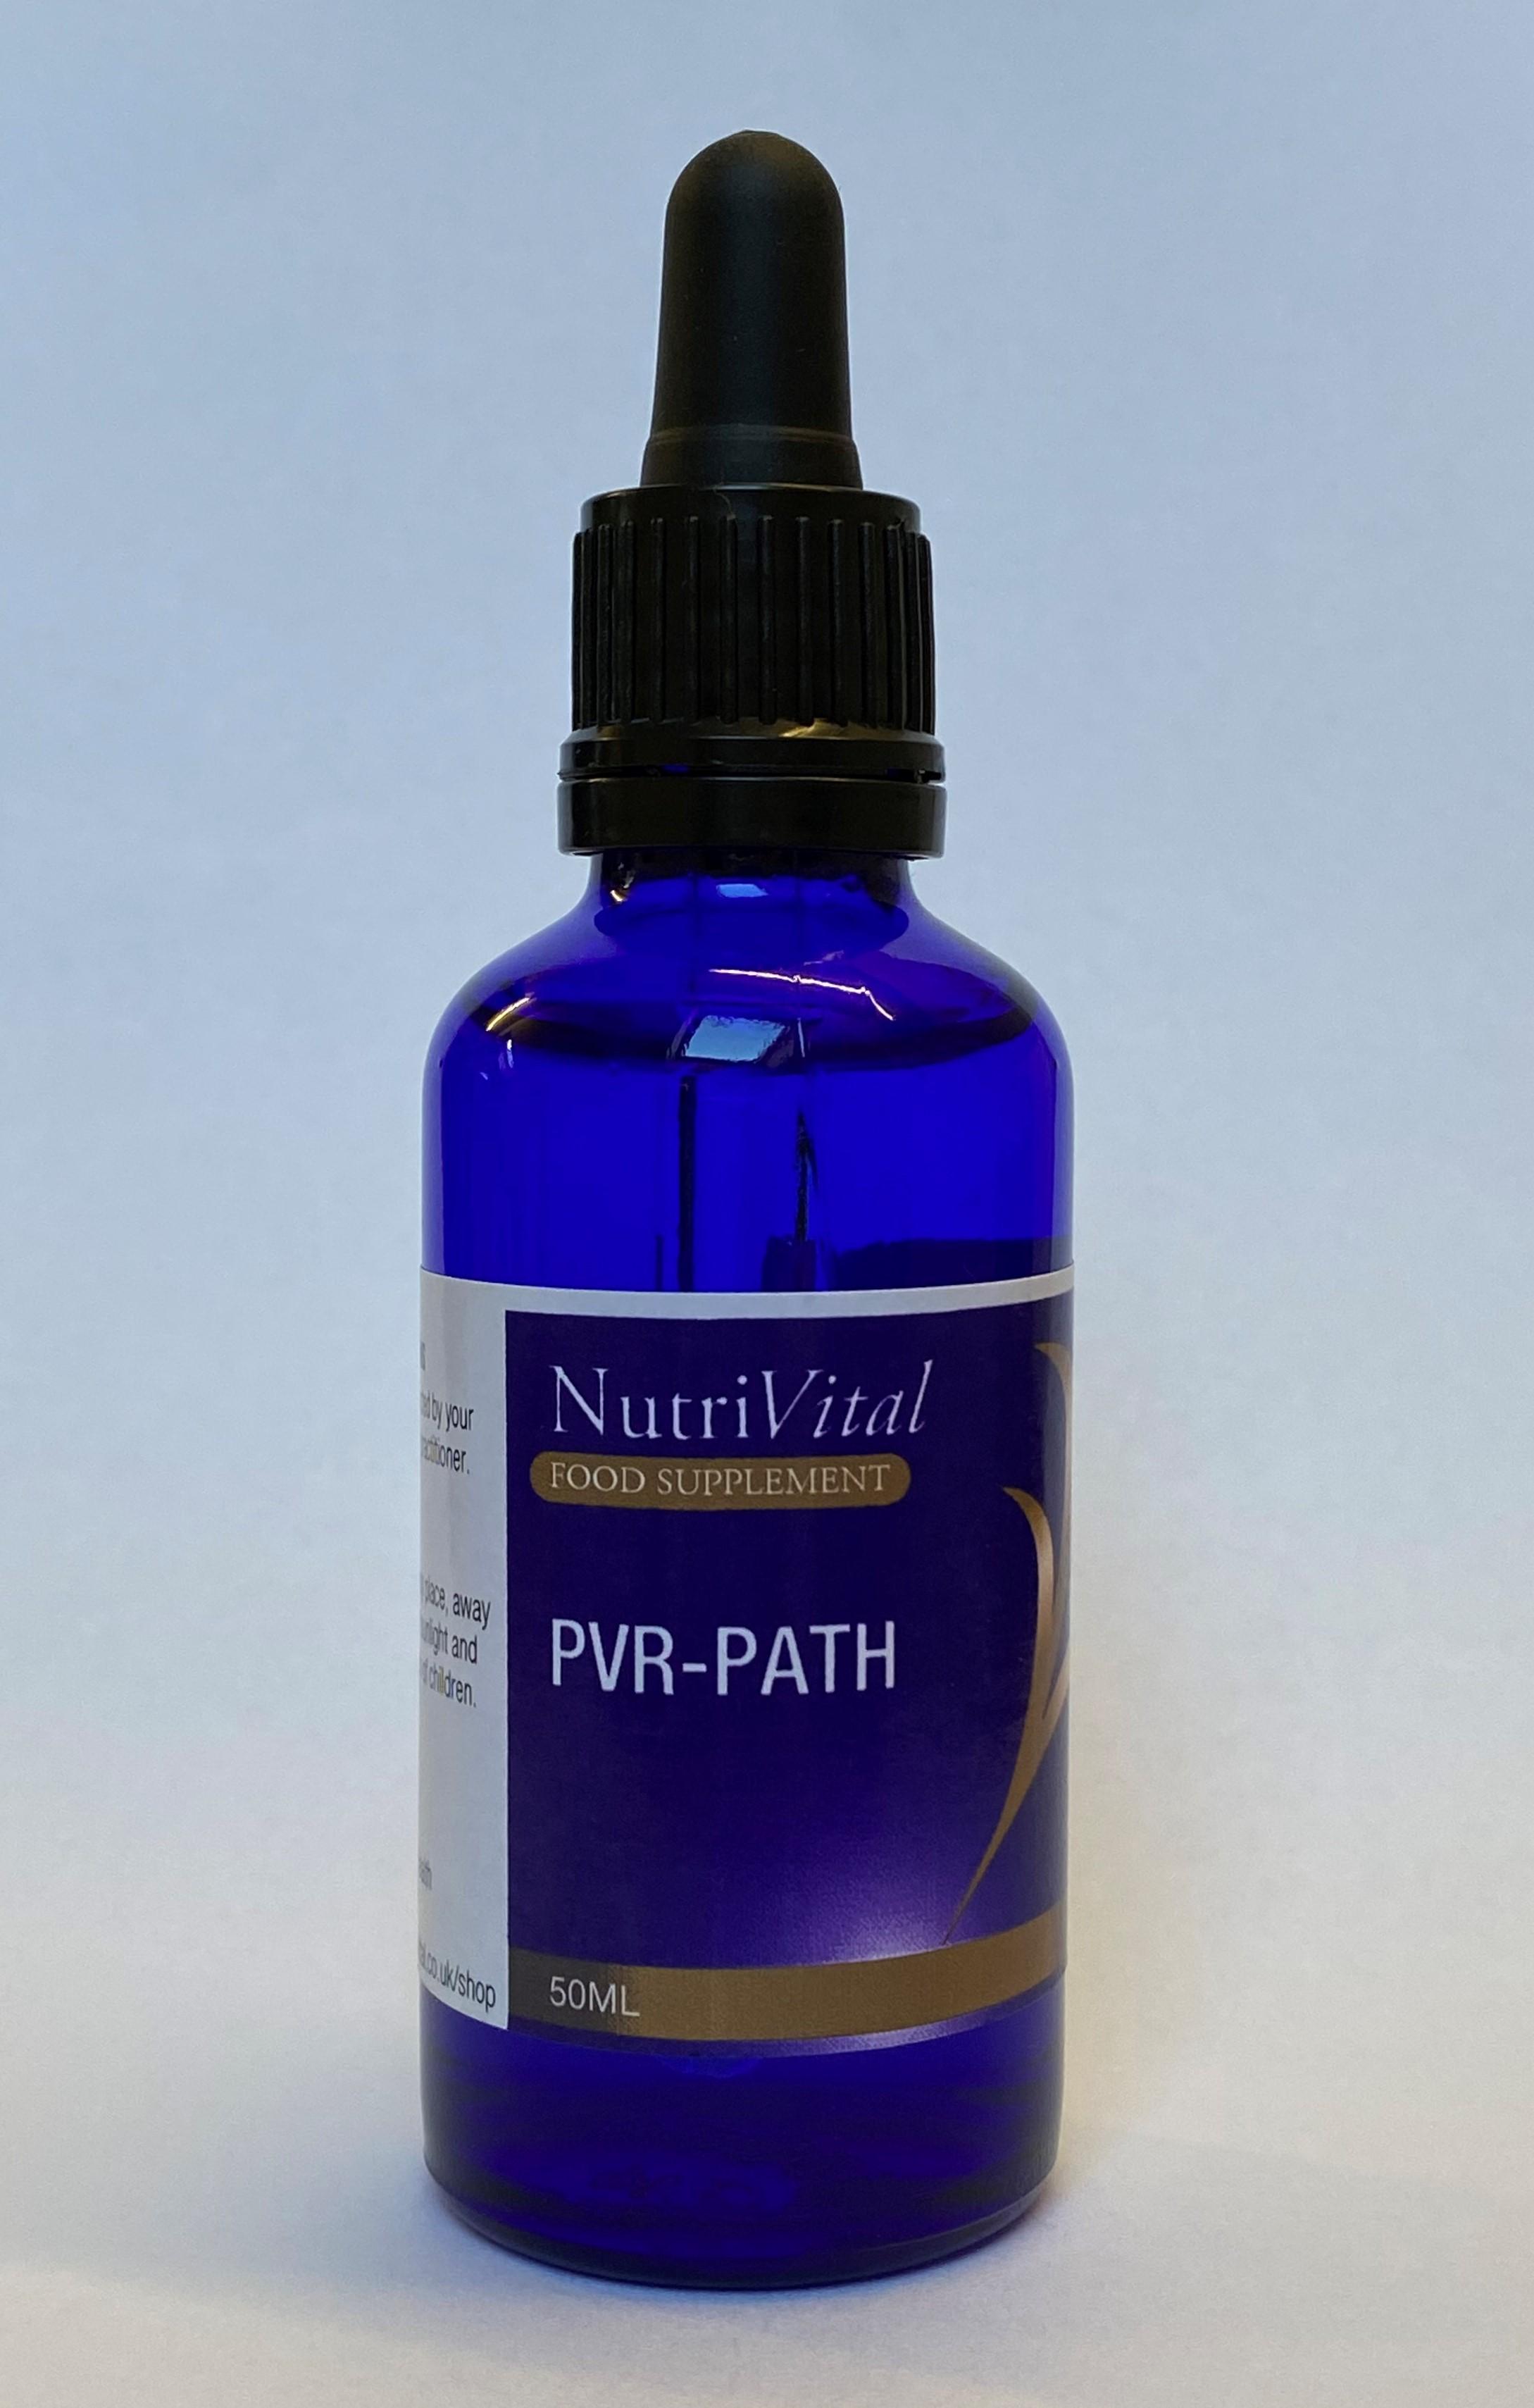 PVR-PATH 50ml